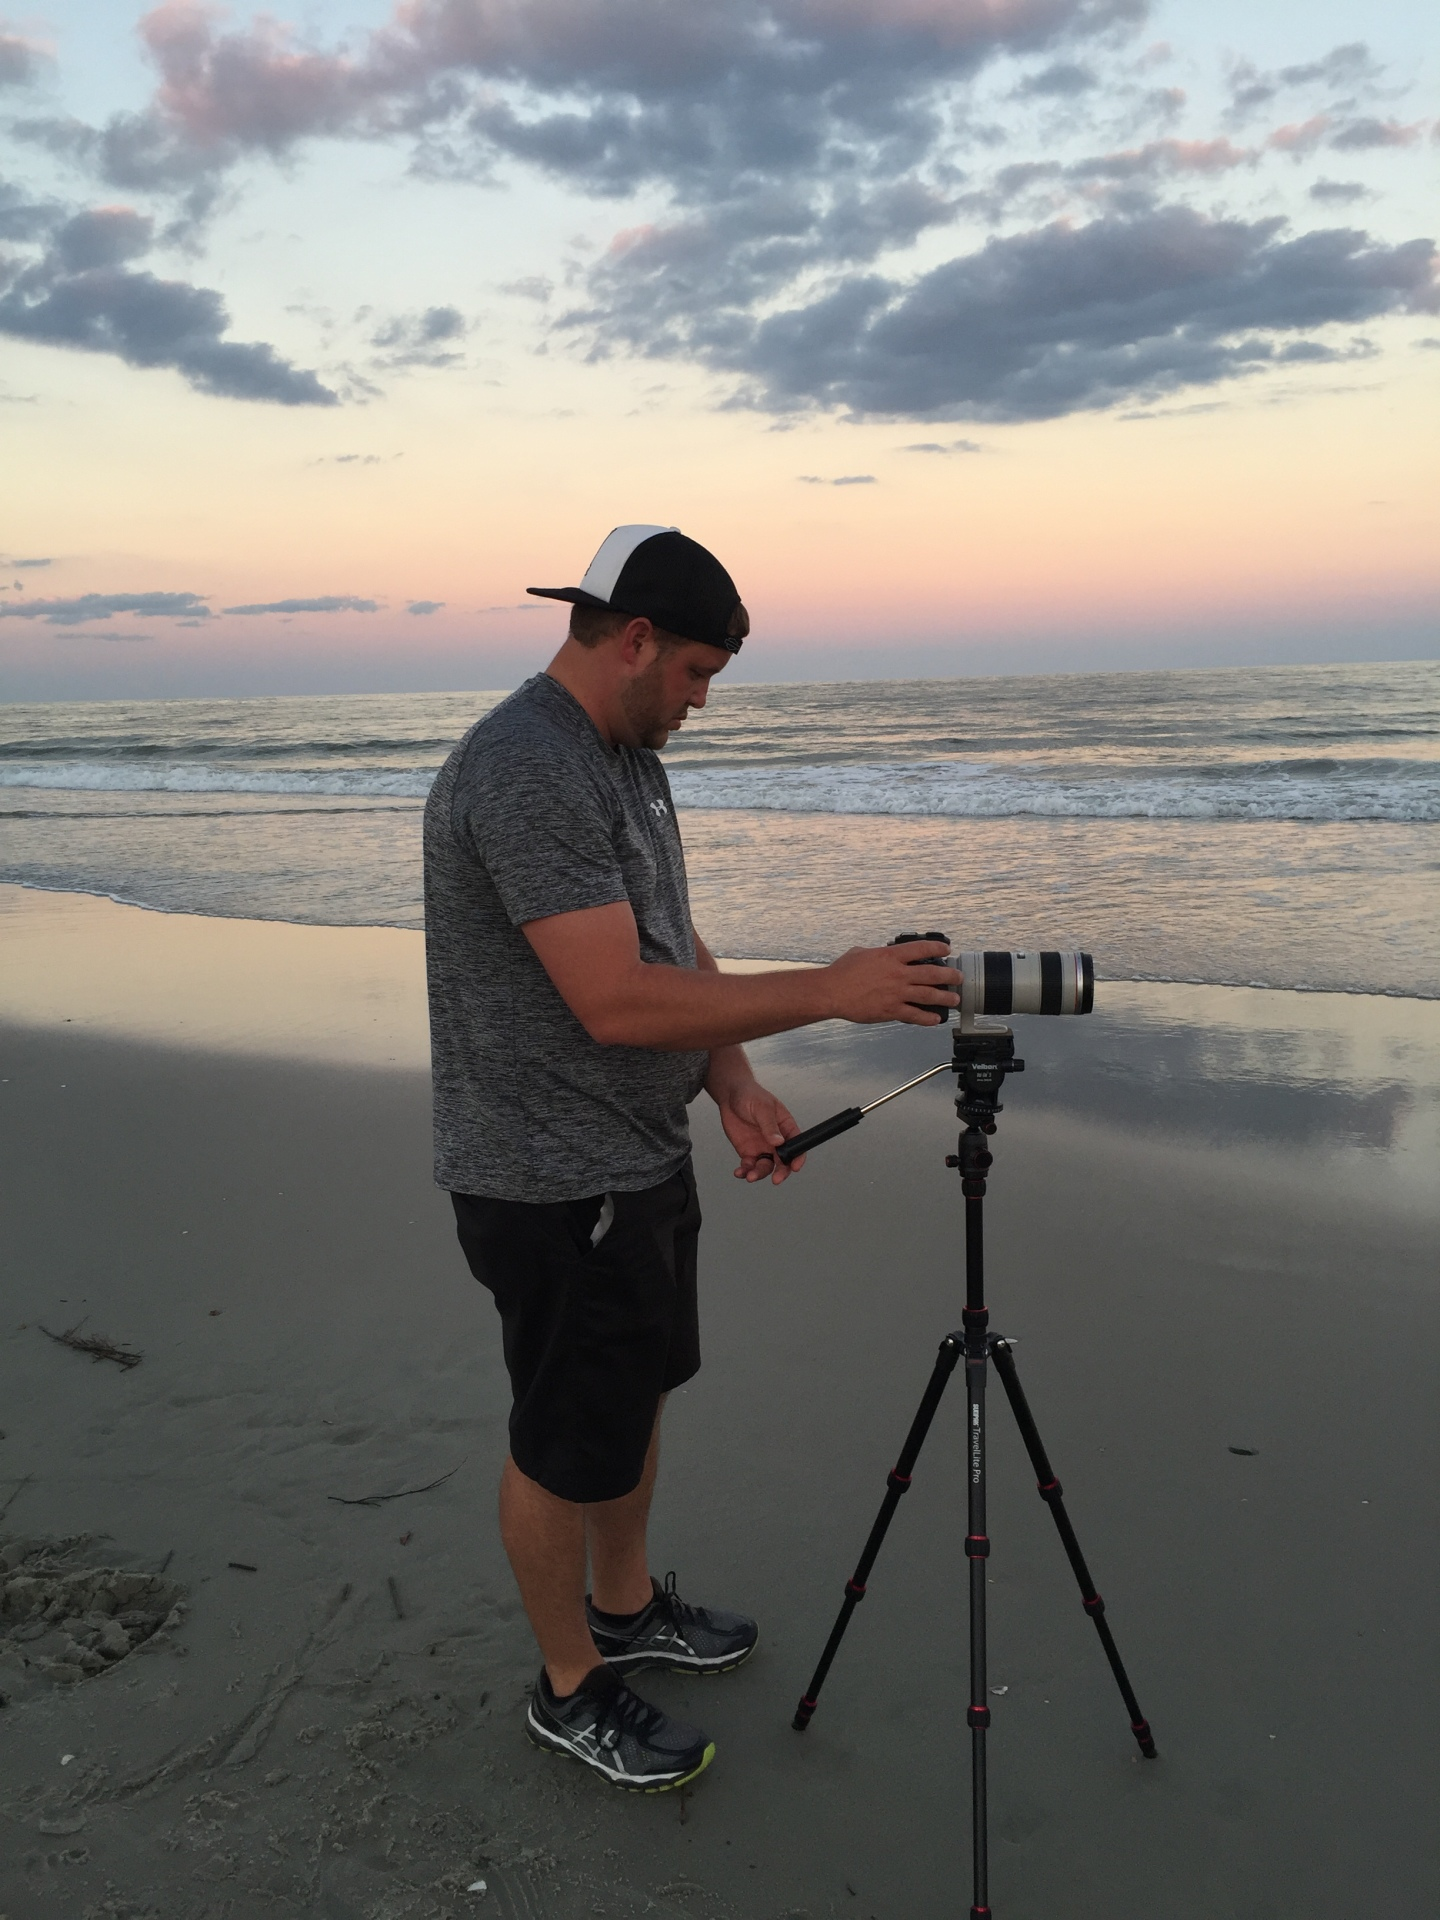 Me shooting the waves